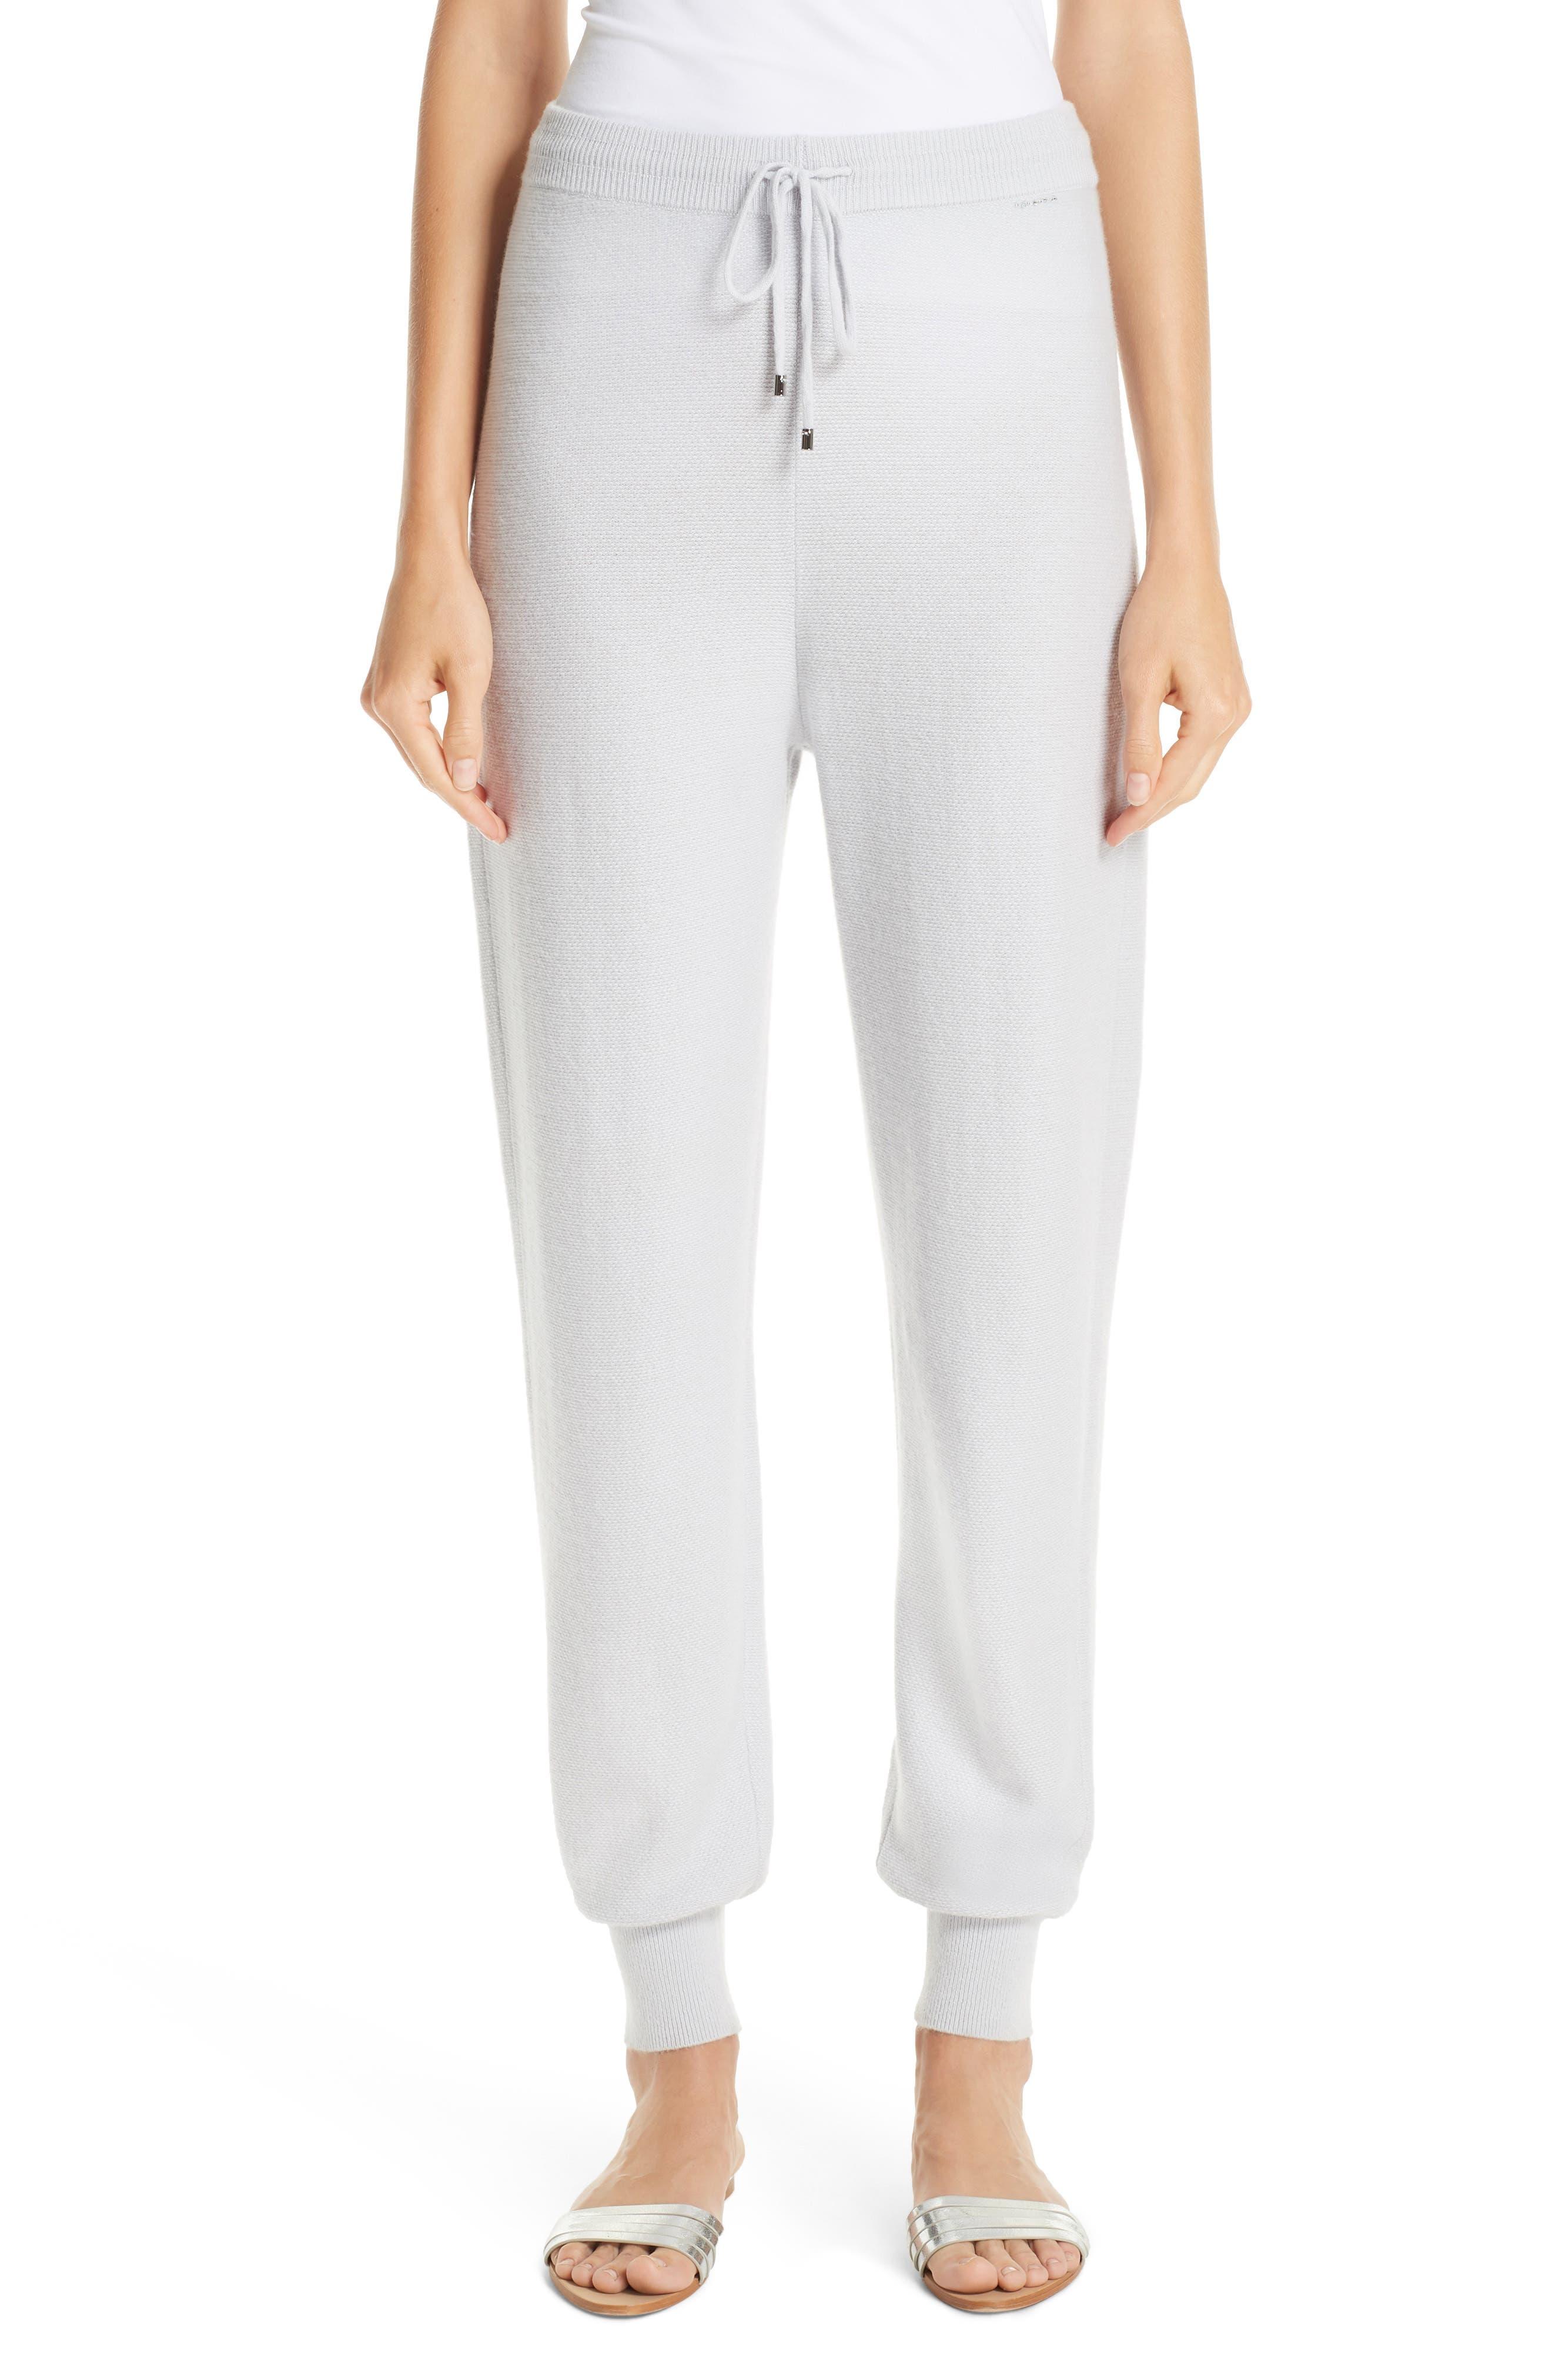 ST. JOHN COLLECTION Float Jacquard Knit Cashmere Pants, Main, color, EARL GREY